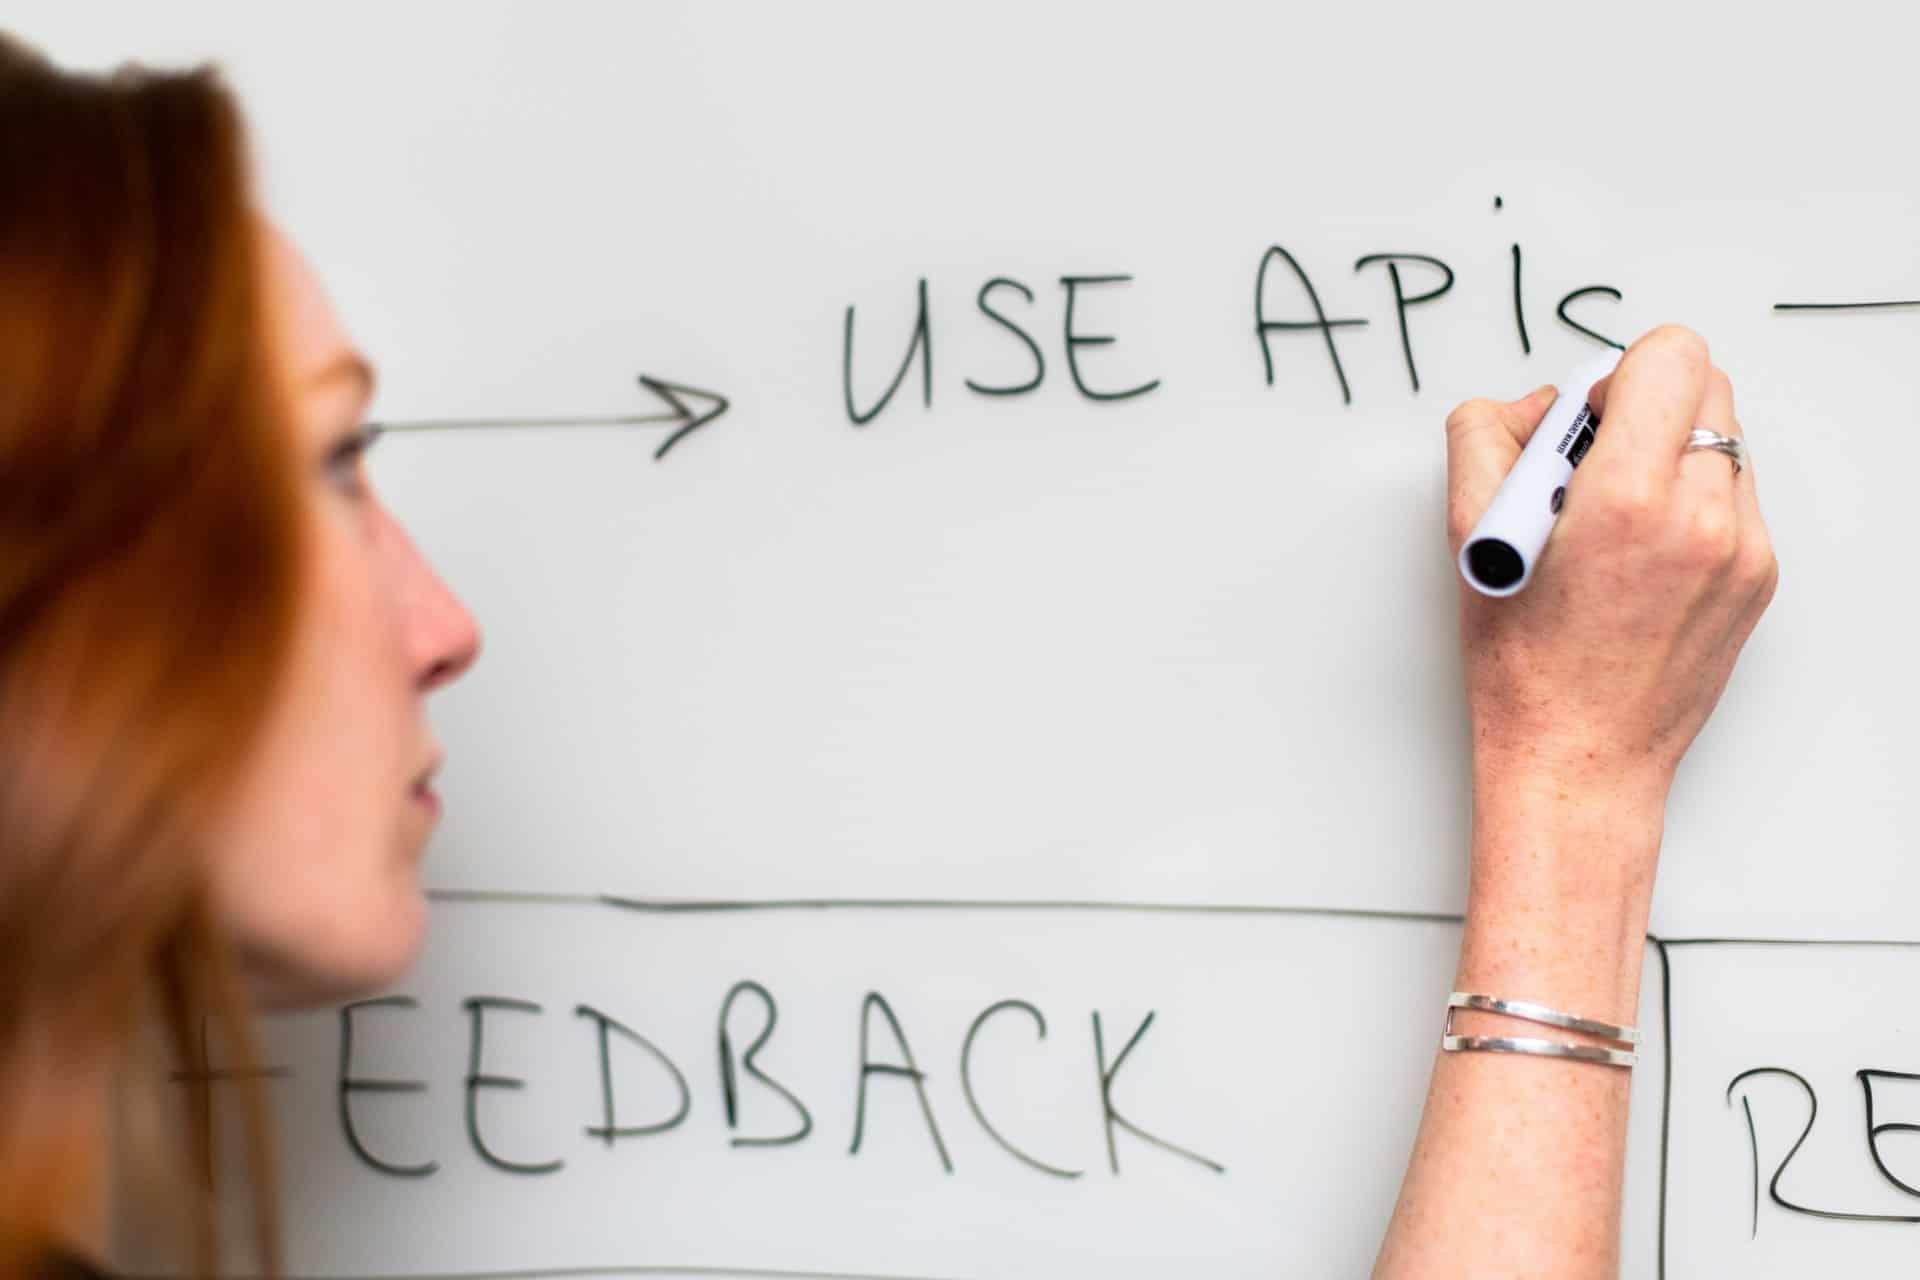 Woman writing API on whiteboard